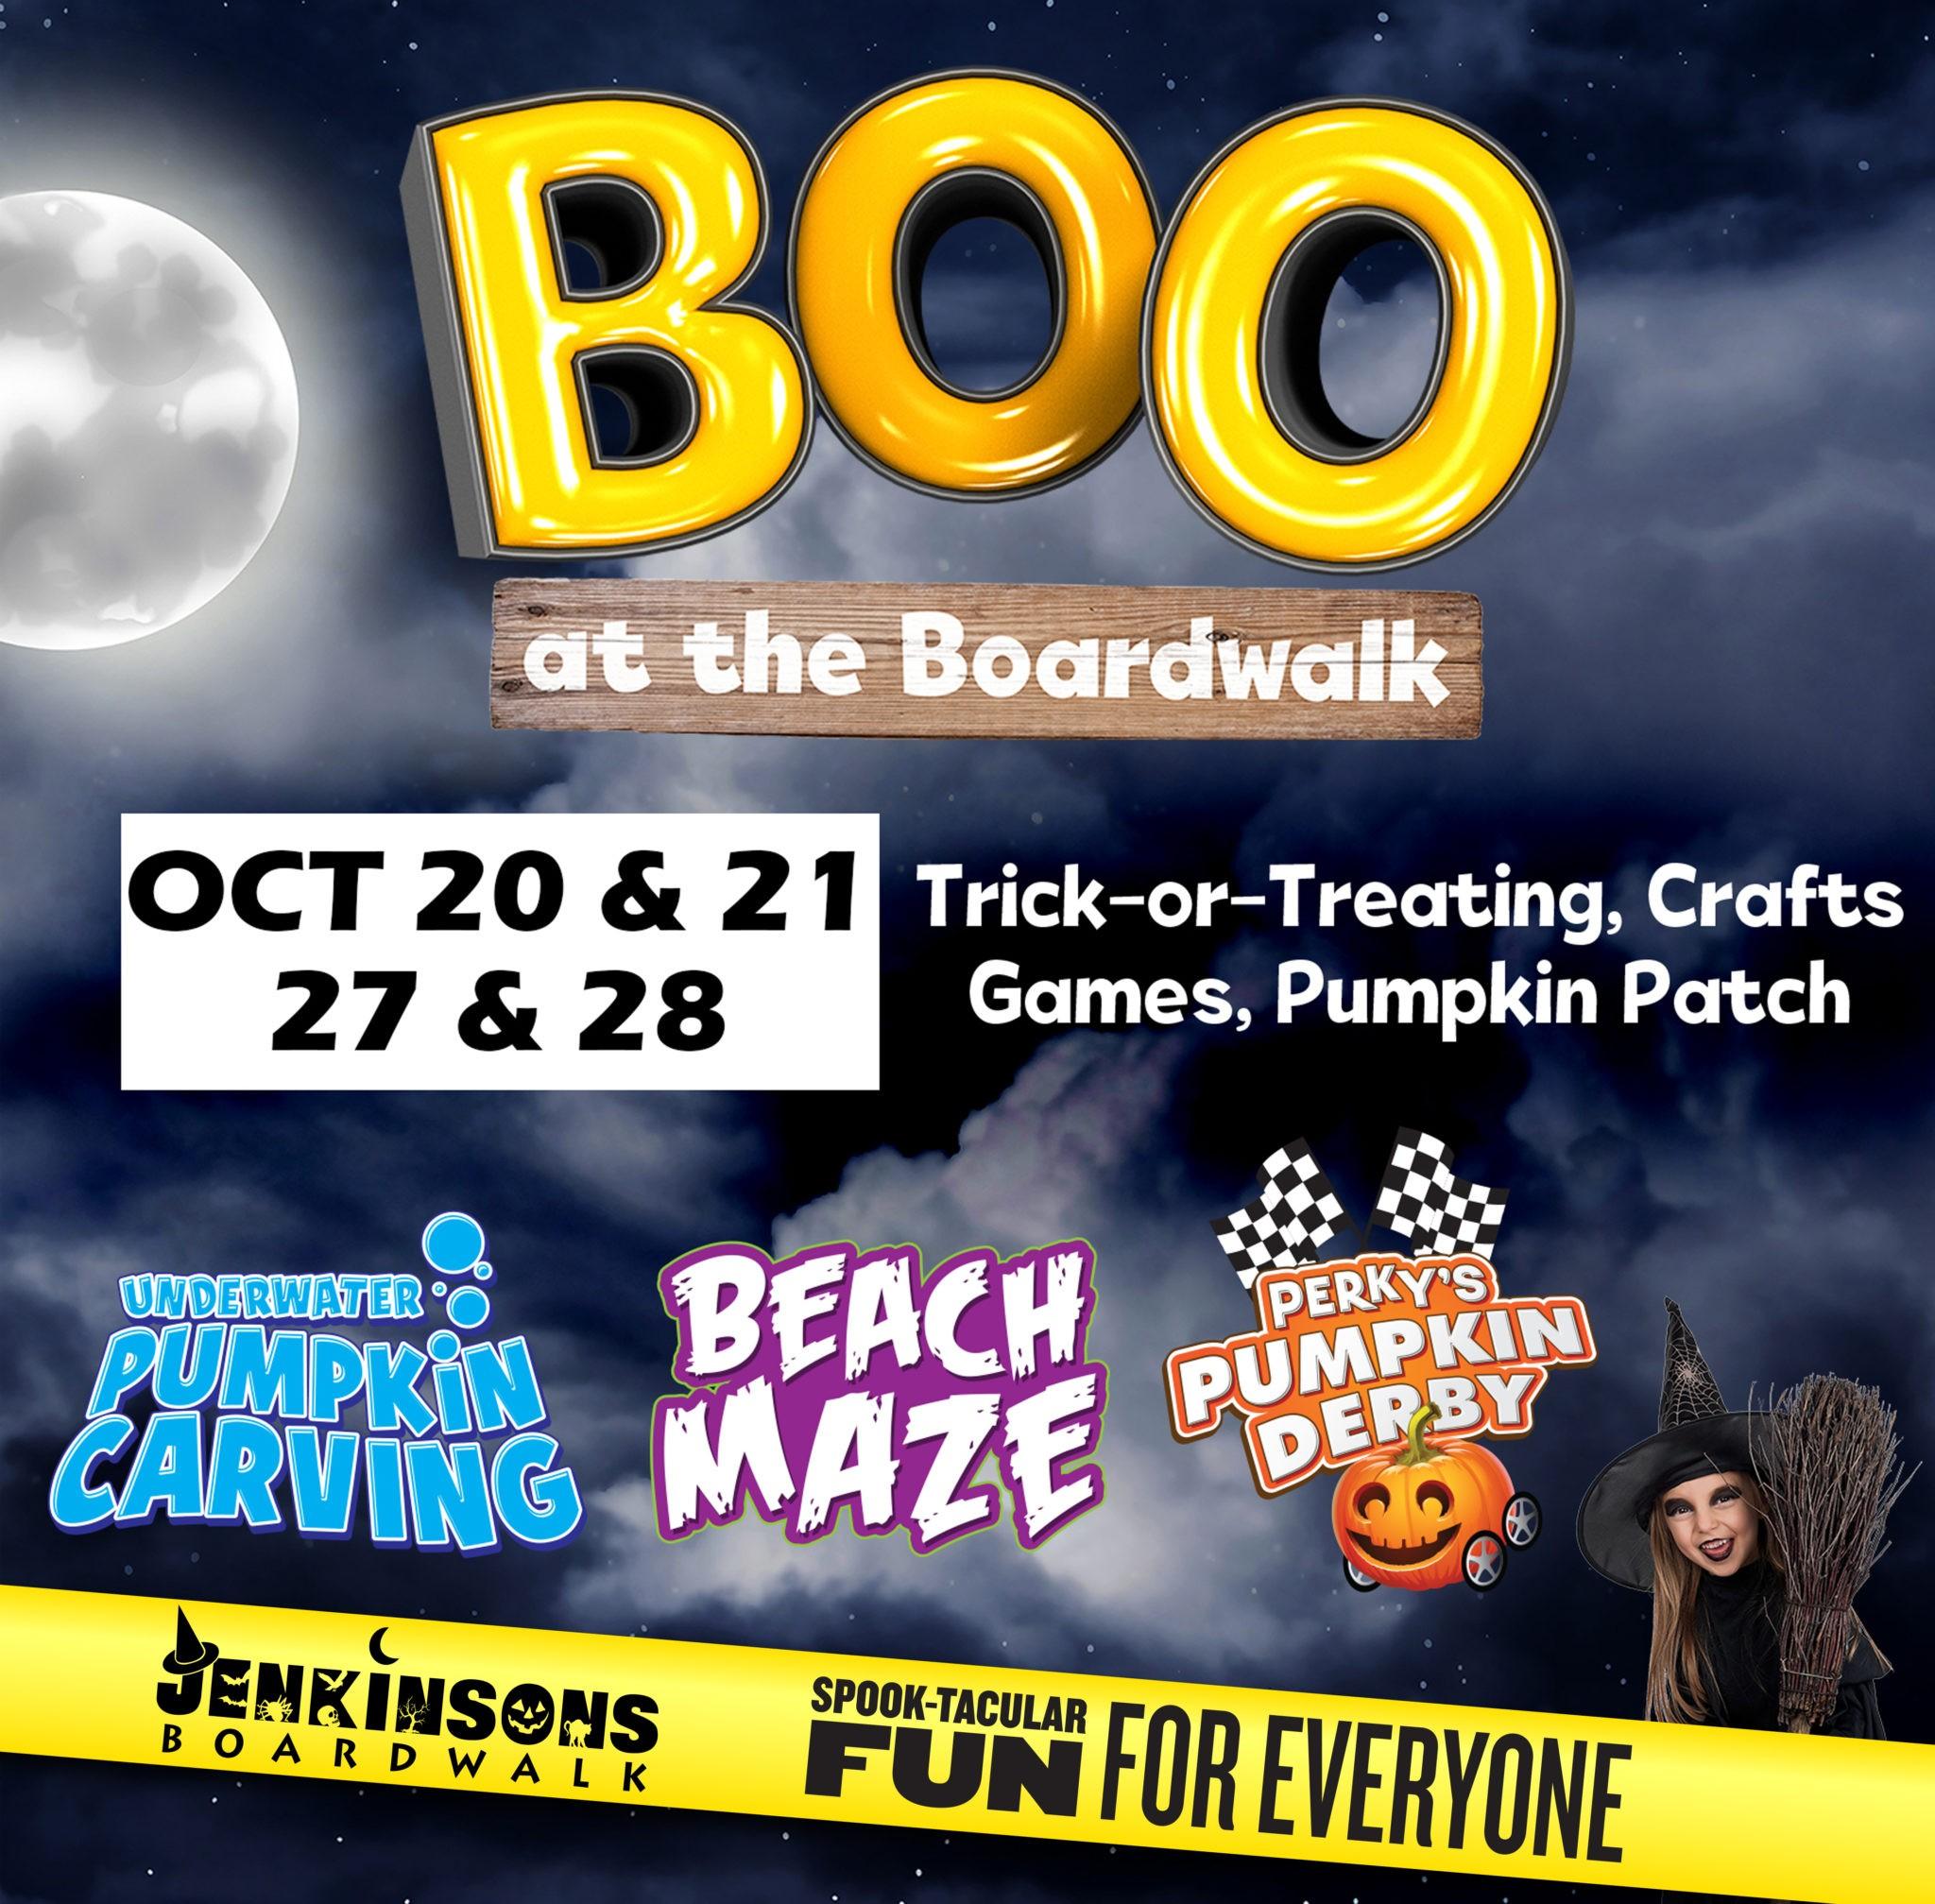 Boo at the Boardwalk